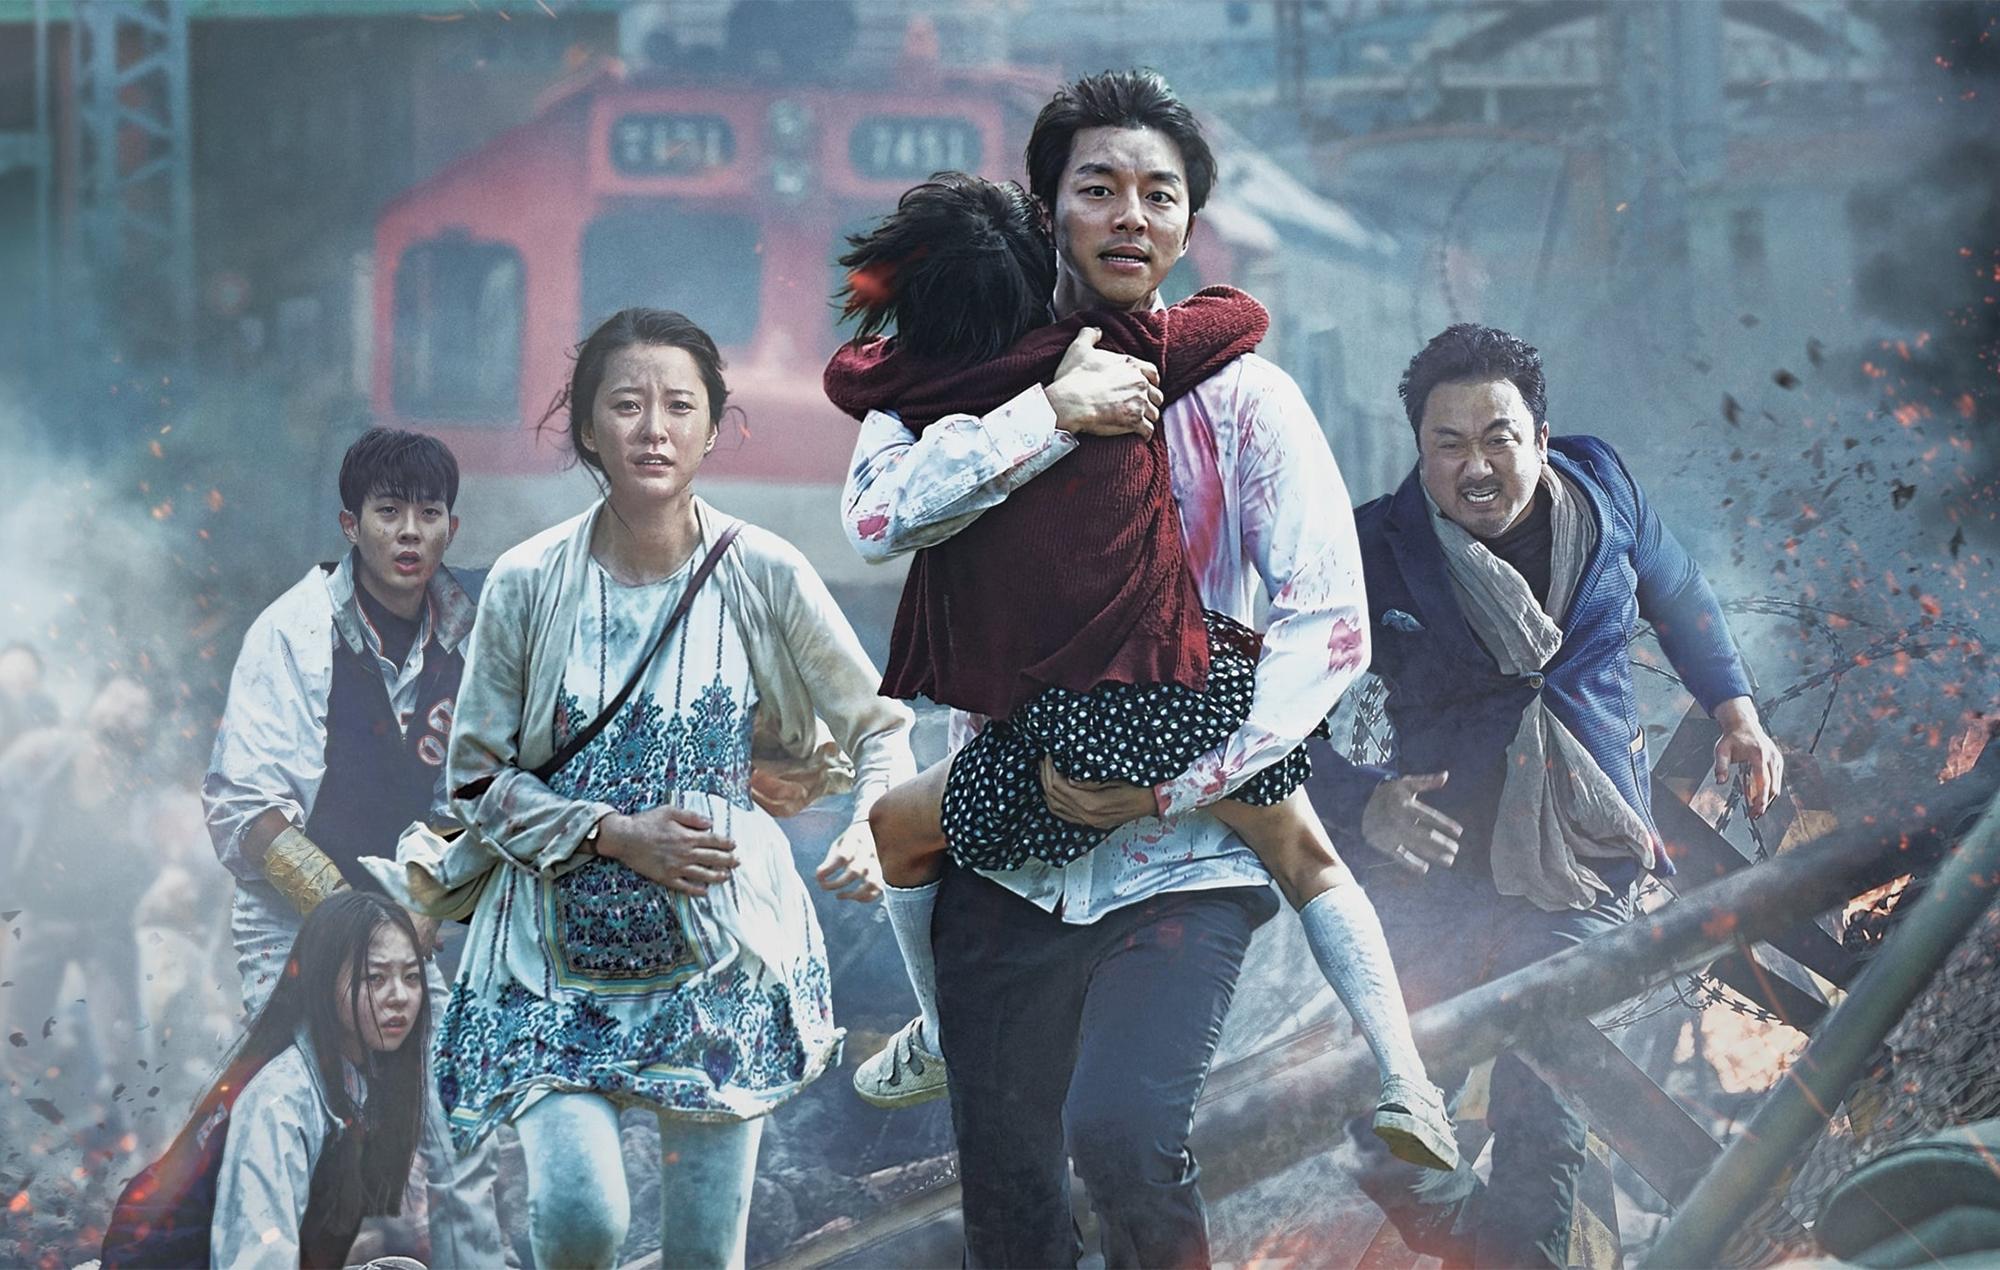 Korean thriller 'Train to Busan' cites 'Mad Max' as sequel influence